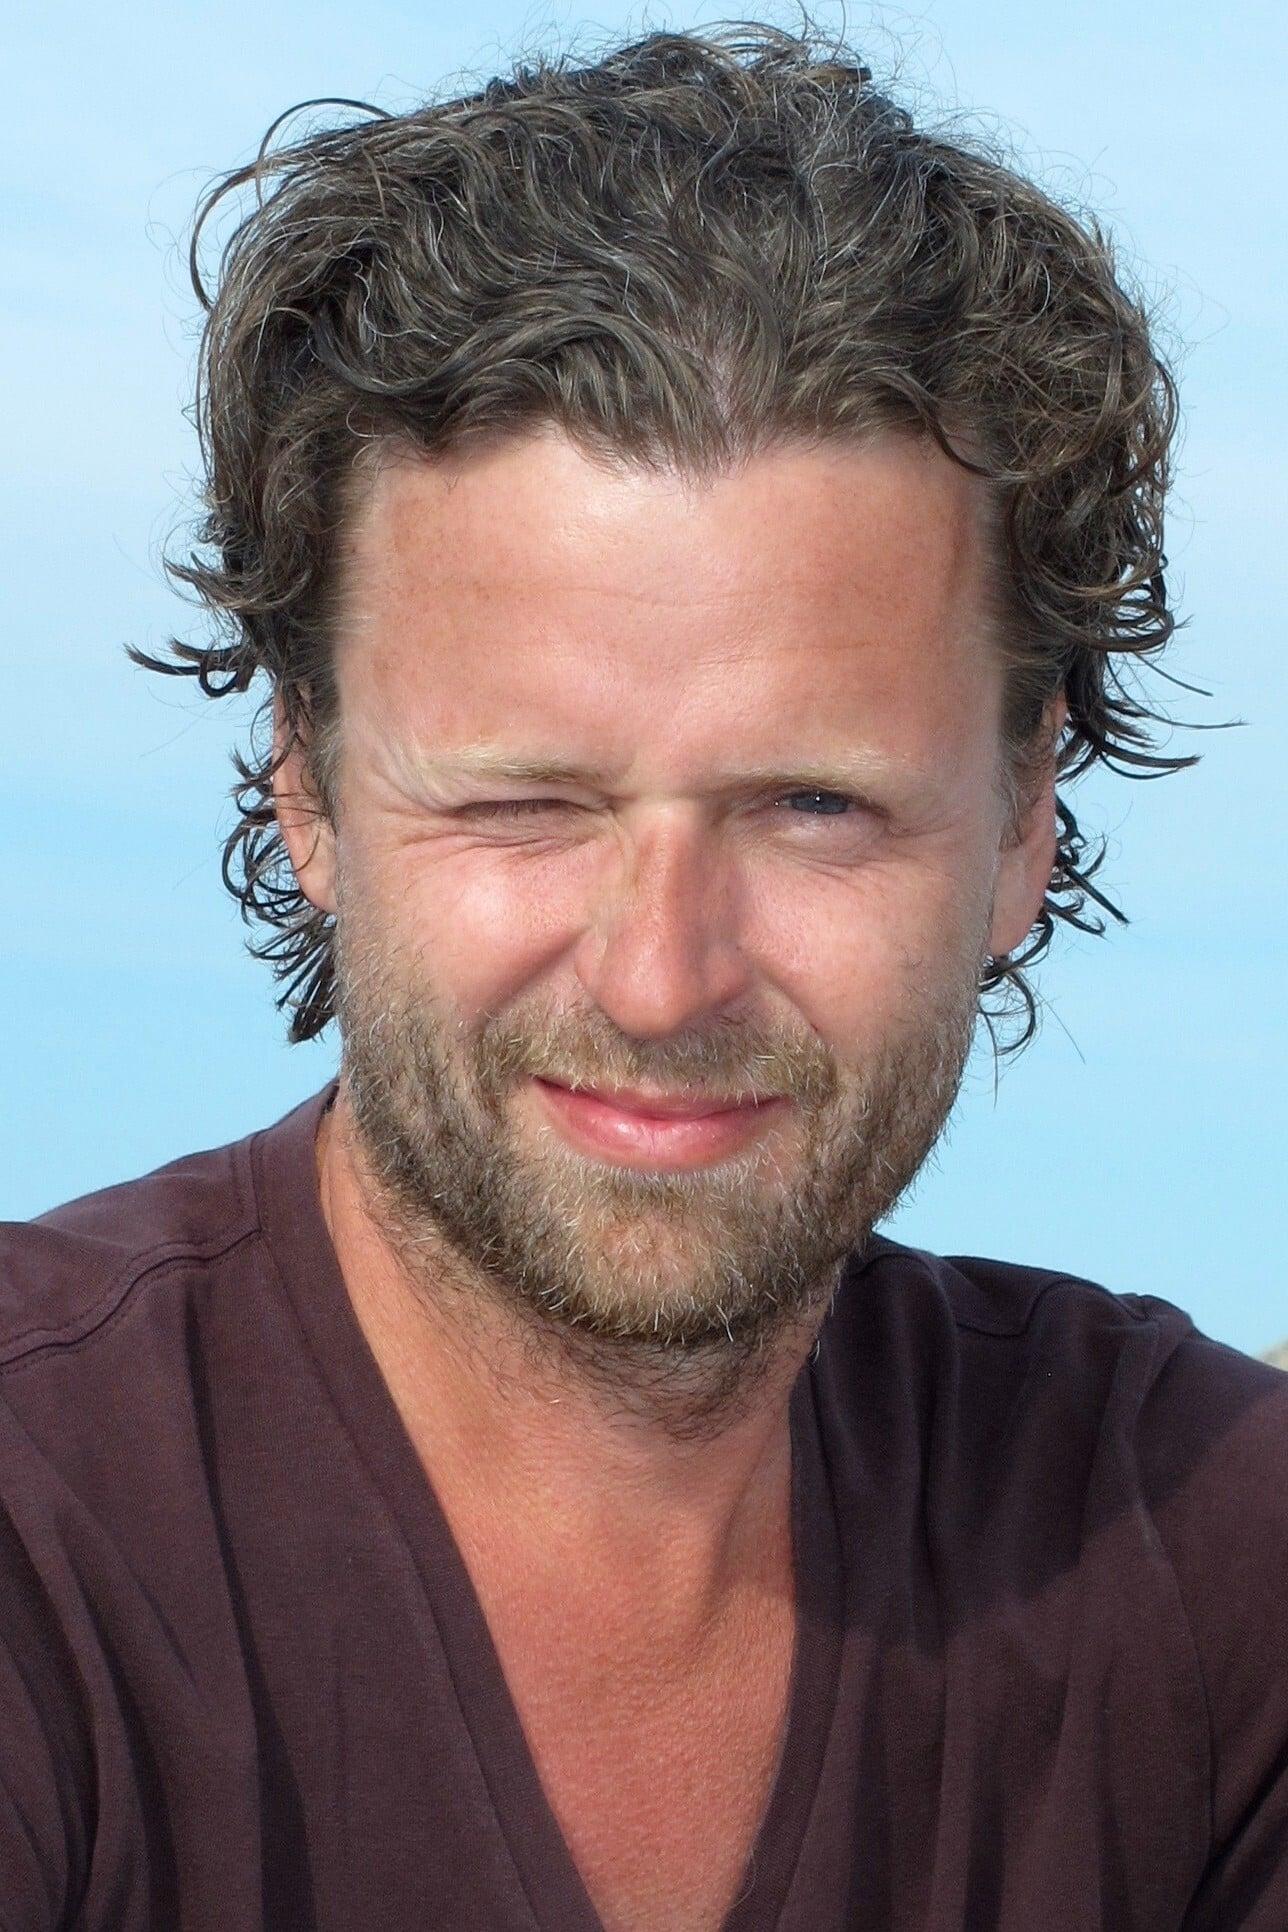 Fredrik Morheden